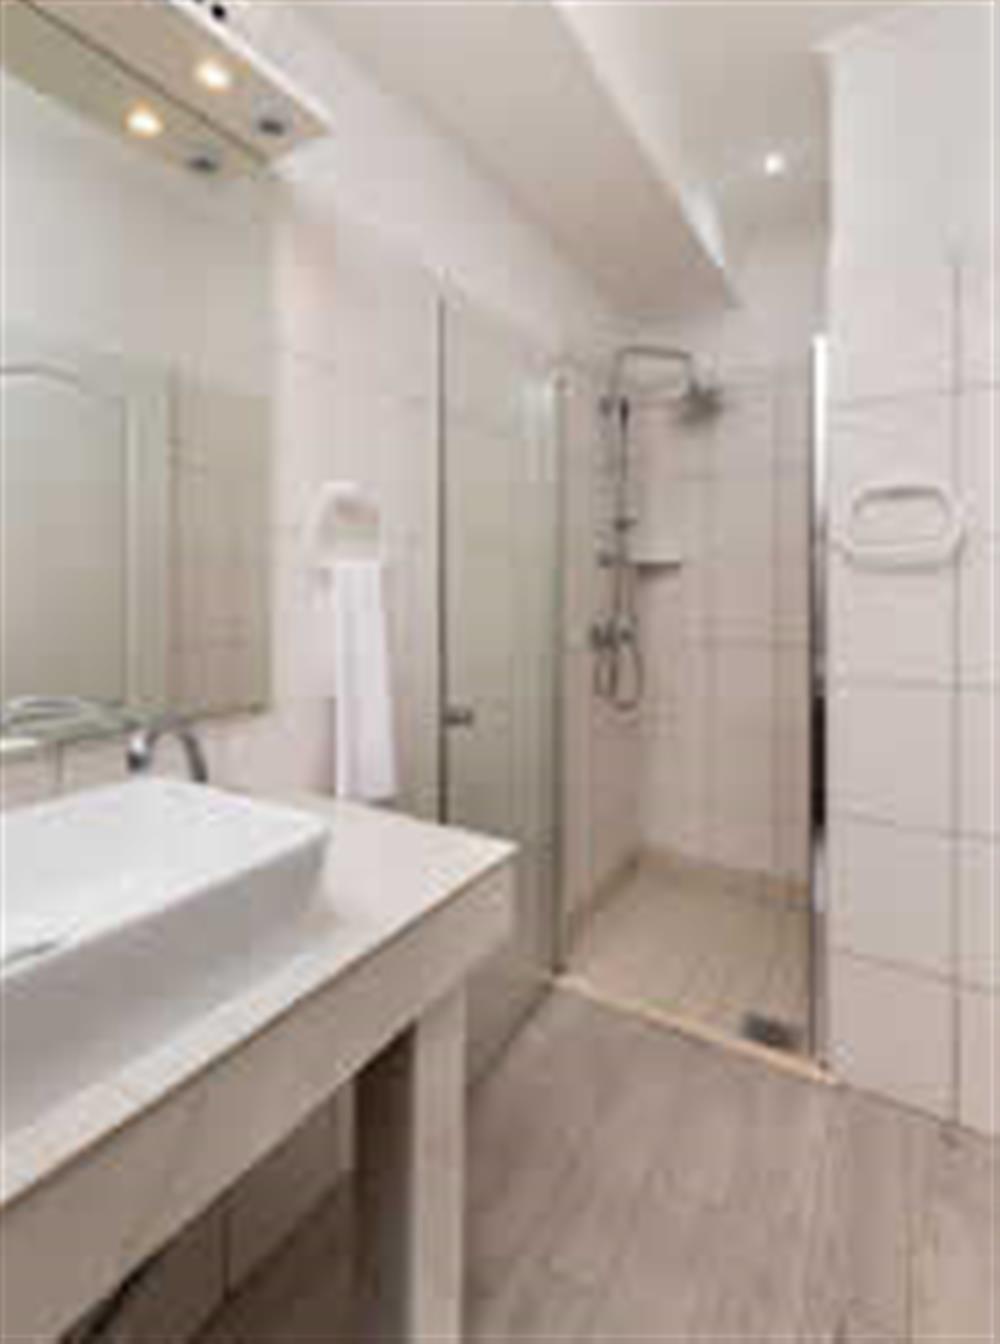 Bathroom (photo 4) at Villa Seaside Fortress View, Dubrovnik, Dubrovnik Region